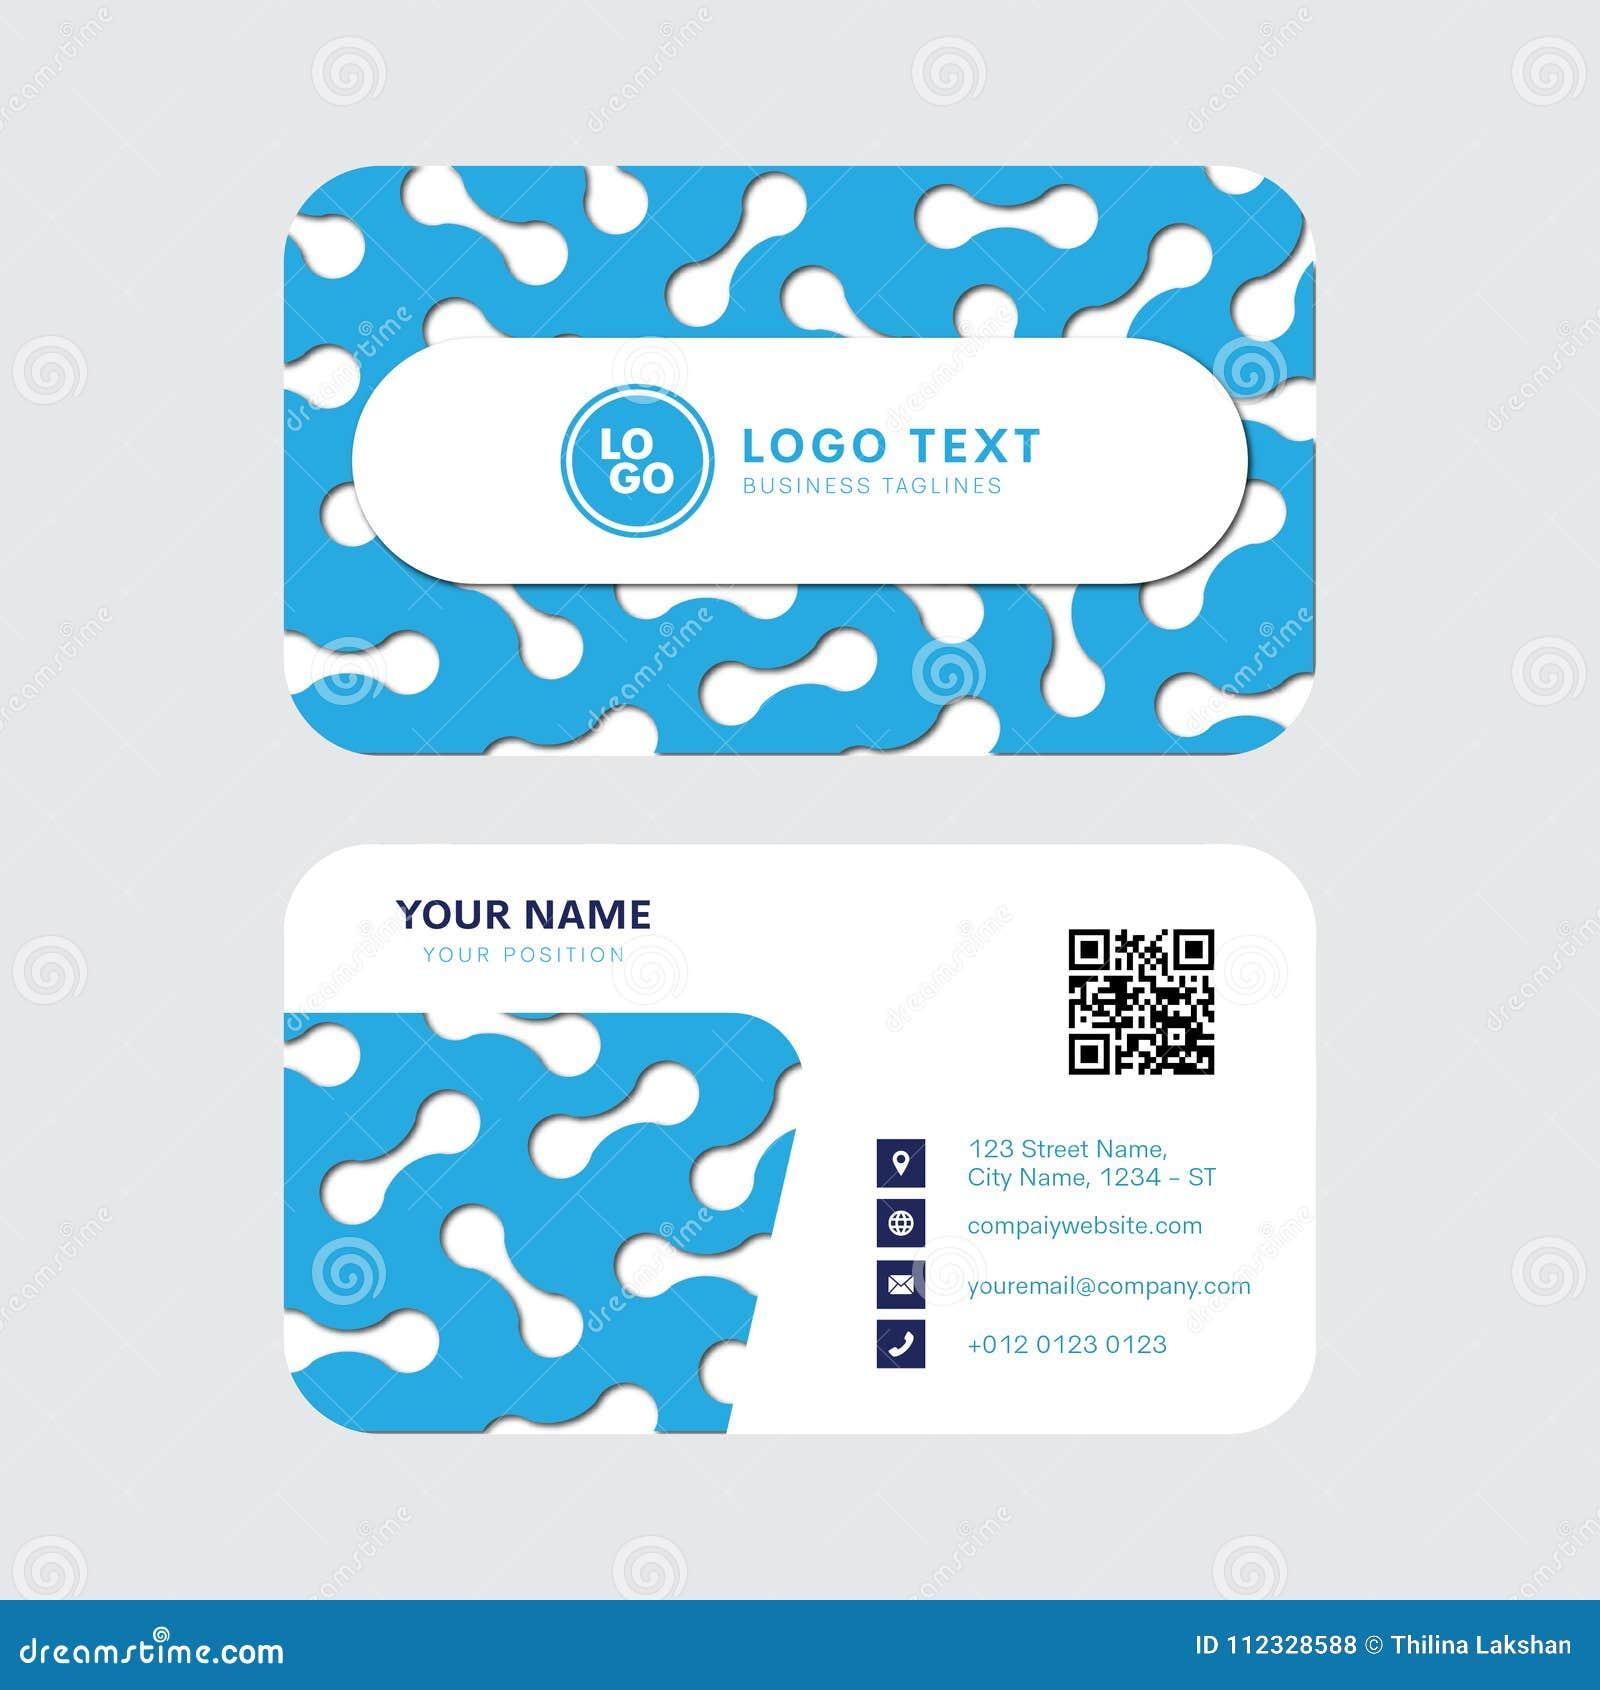 professional business card vector design invitation card template